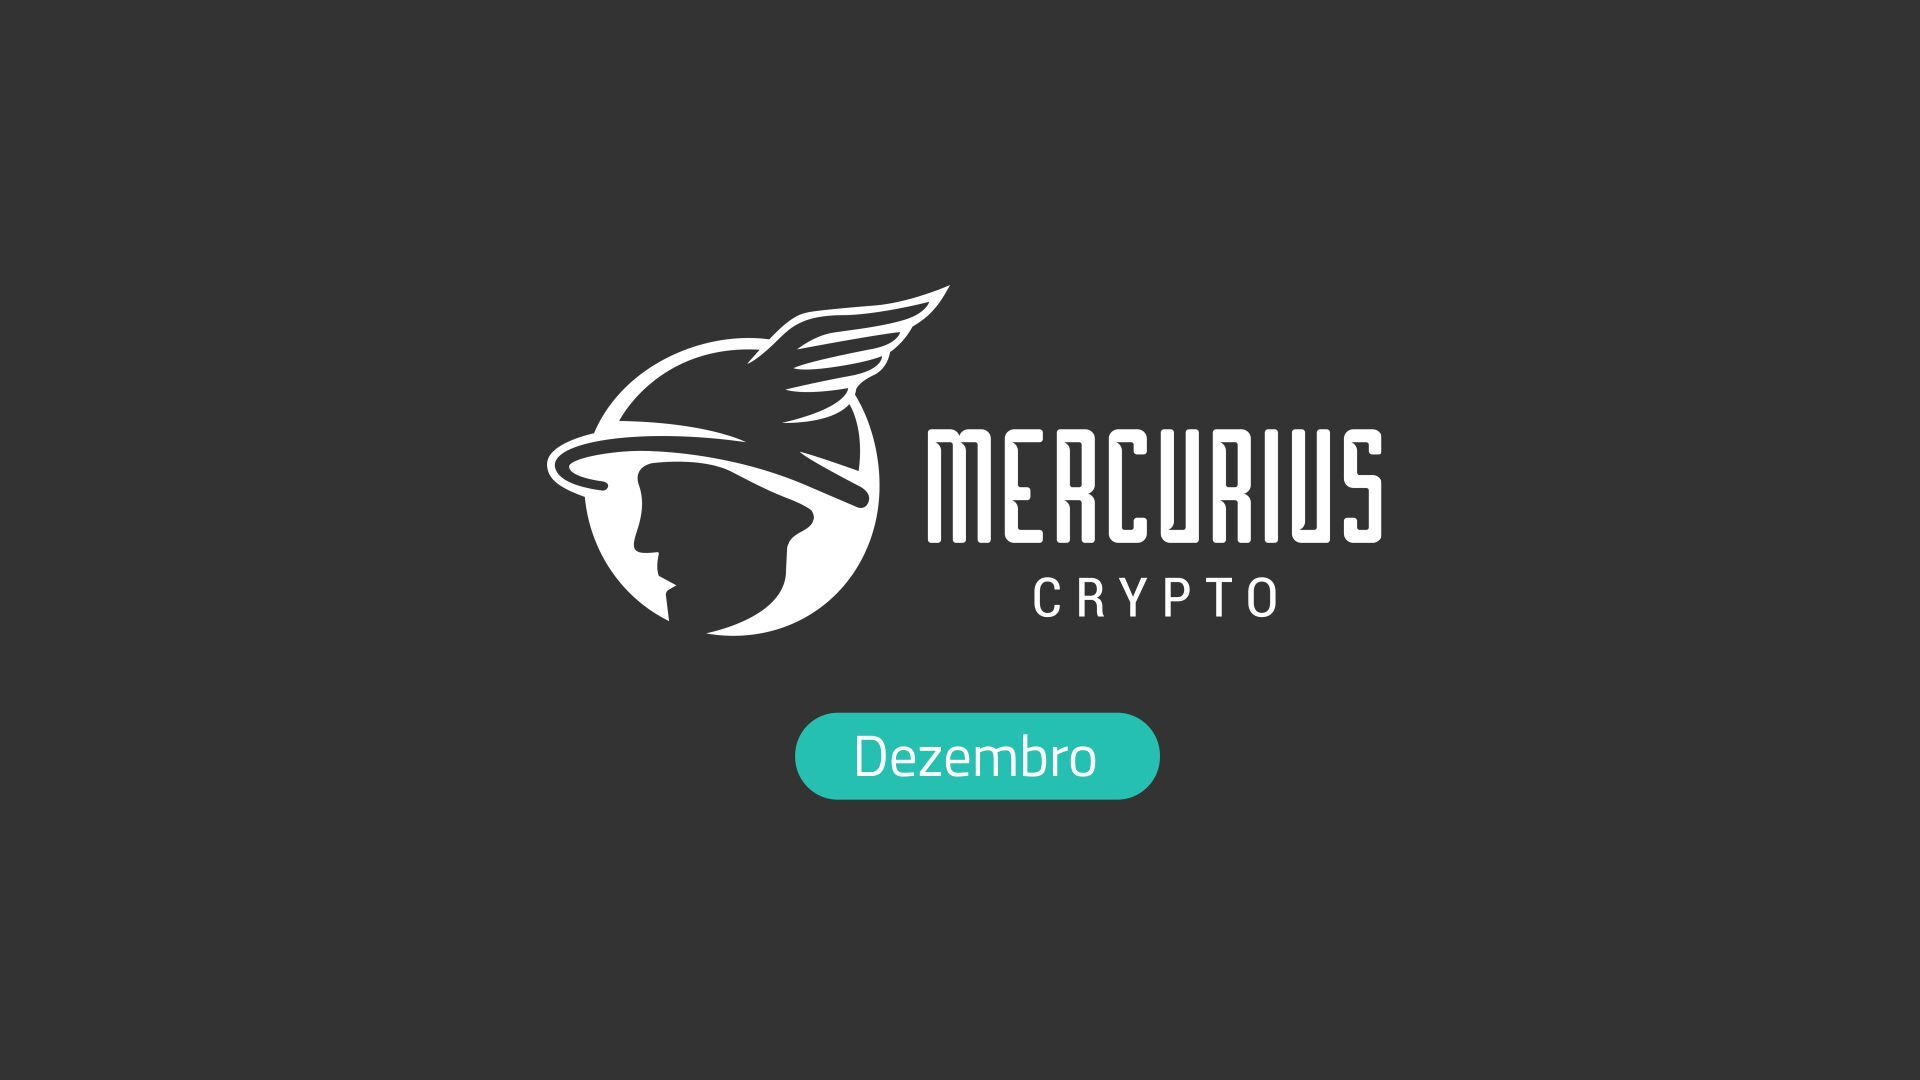 Retrospectiva cripto - O que esperar para 2021: Report de dezembro da Mercurius Crypto